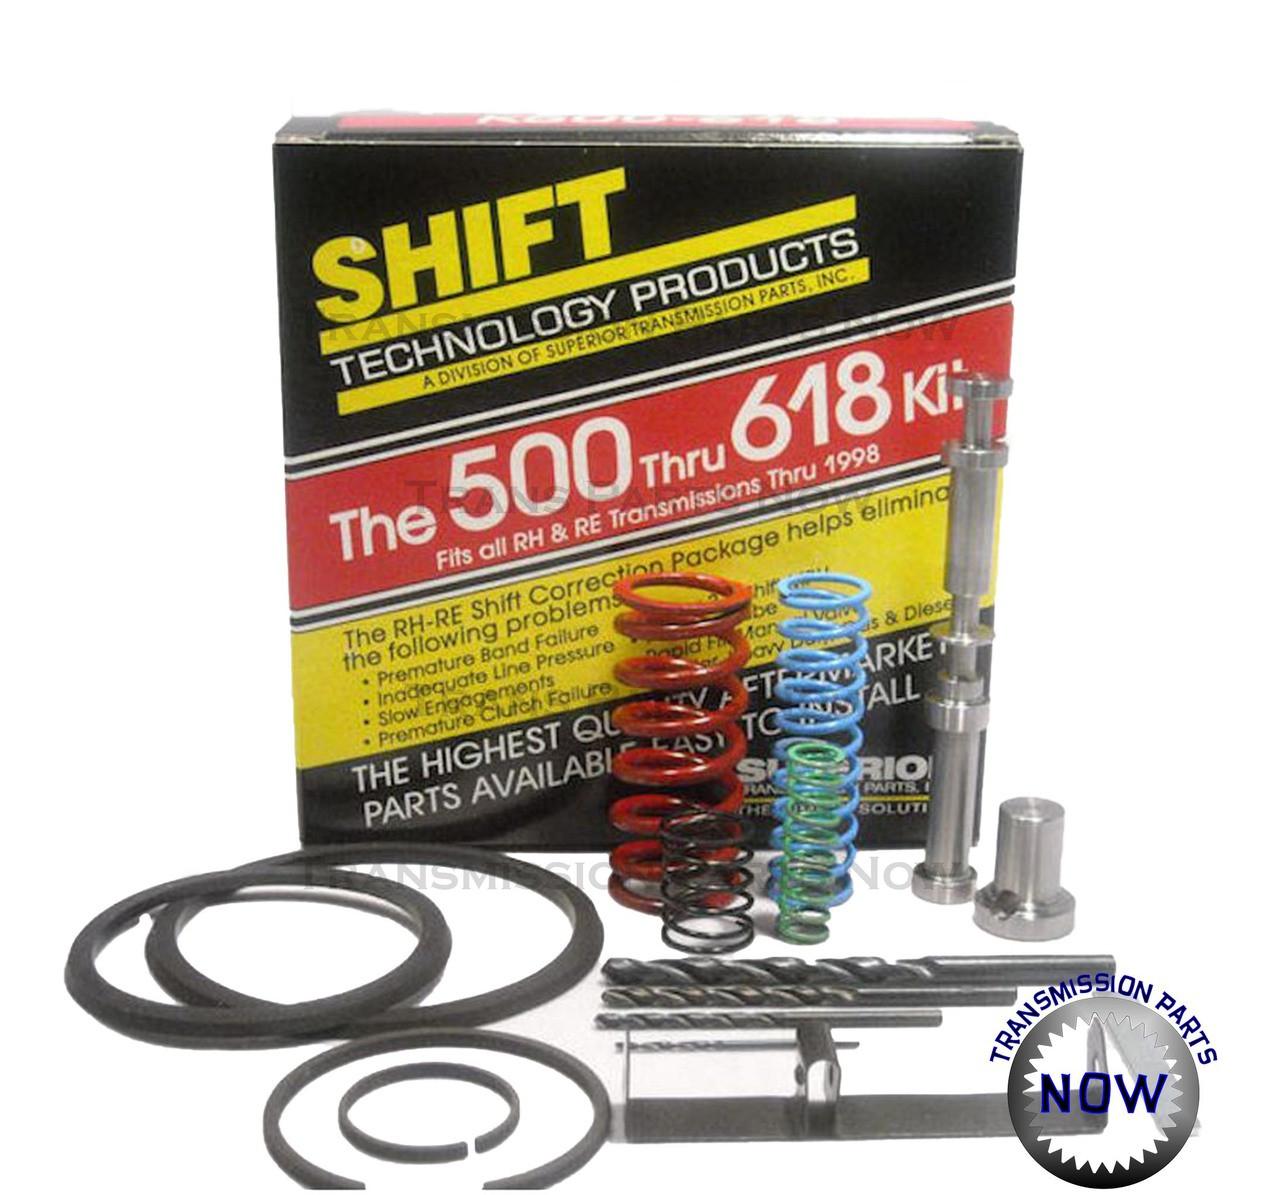 K500-618, Superior Shift correction kit, Shift kit, A500,A518, A618, 42Re, 42RH, 44RE, 44RH, 46RE, 46RH, 47RE, transmission parts, 22167S, S22167